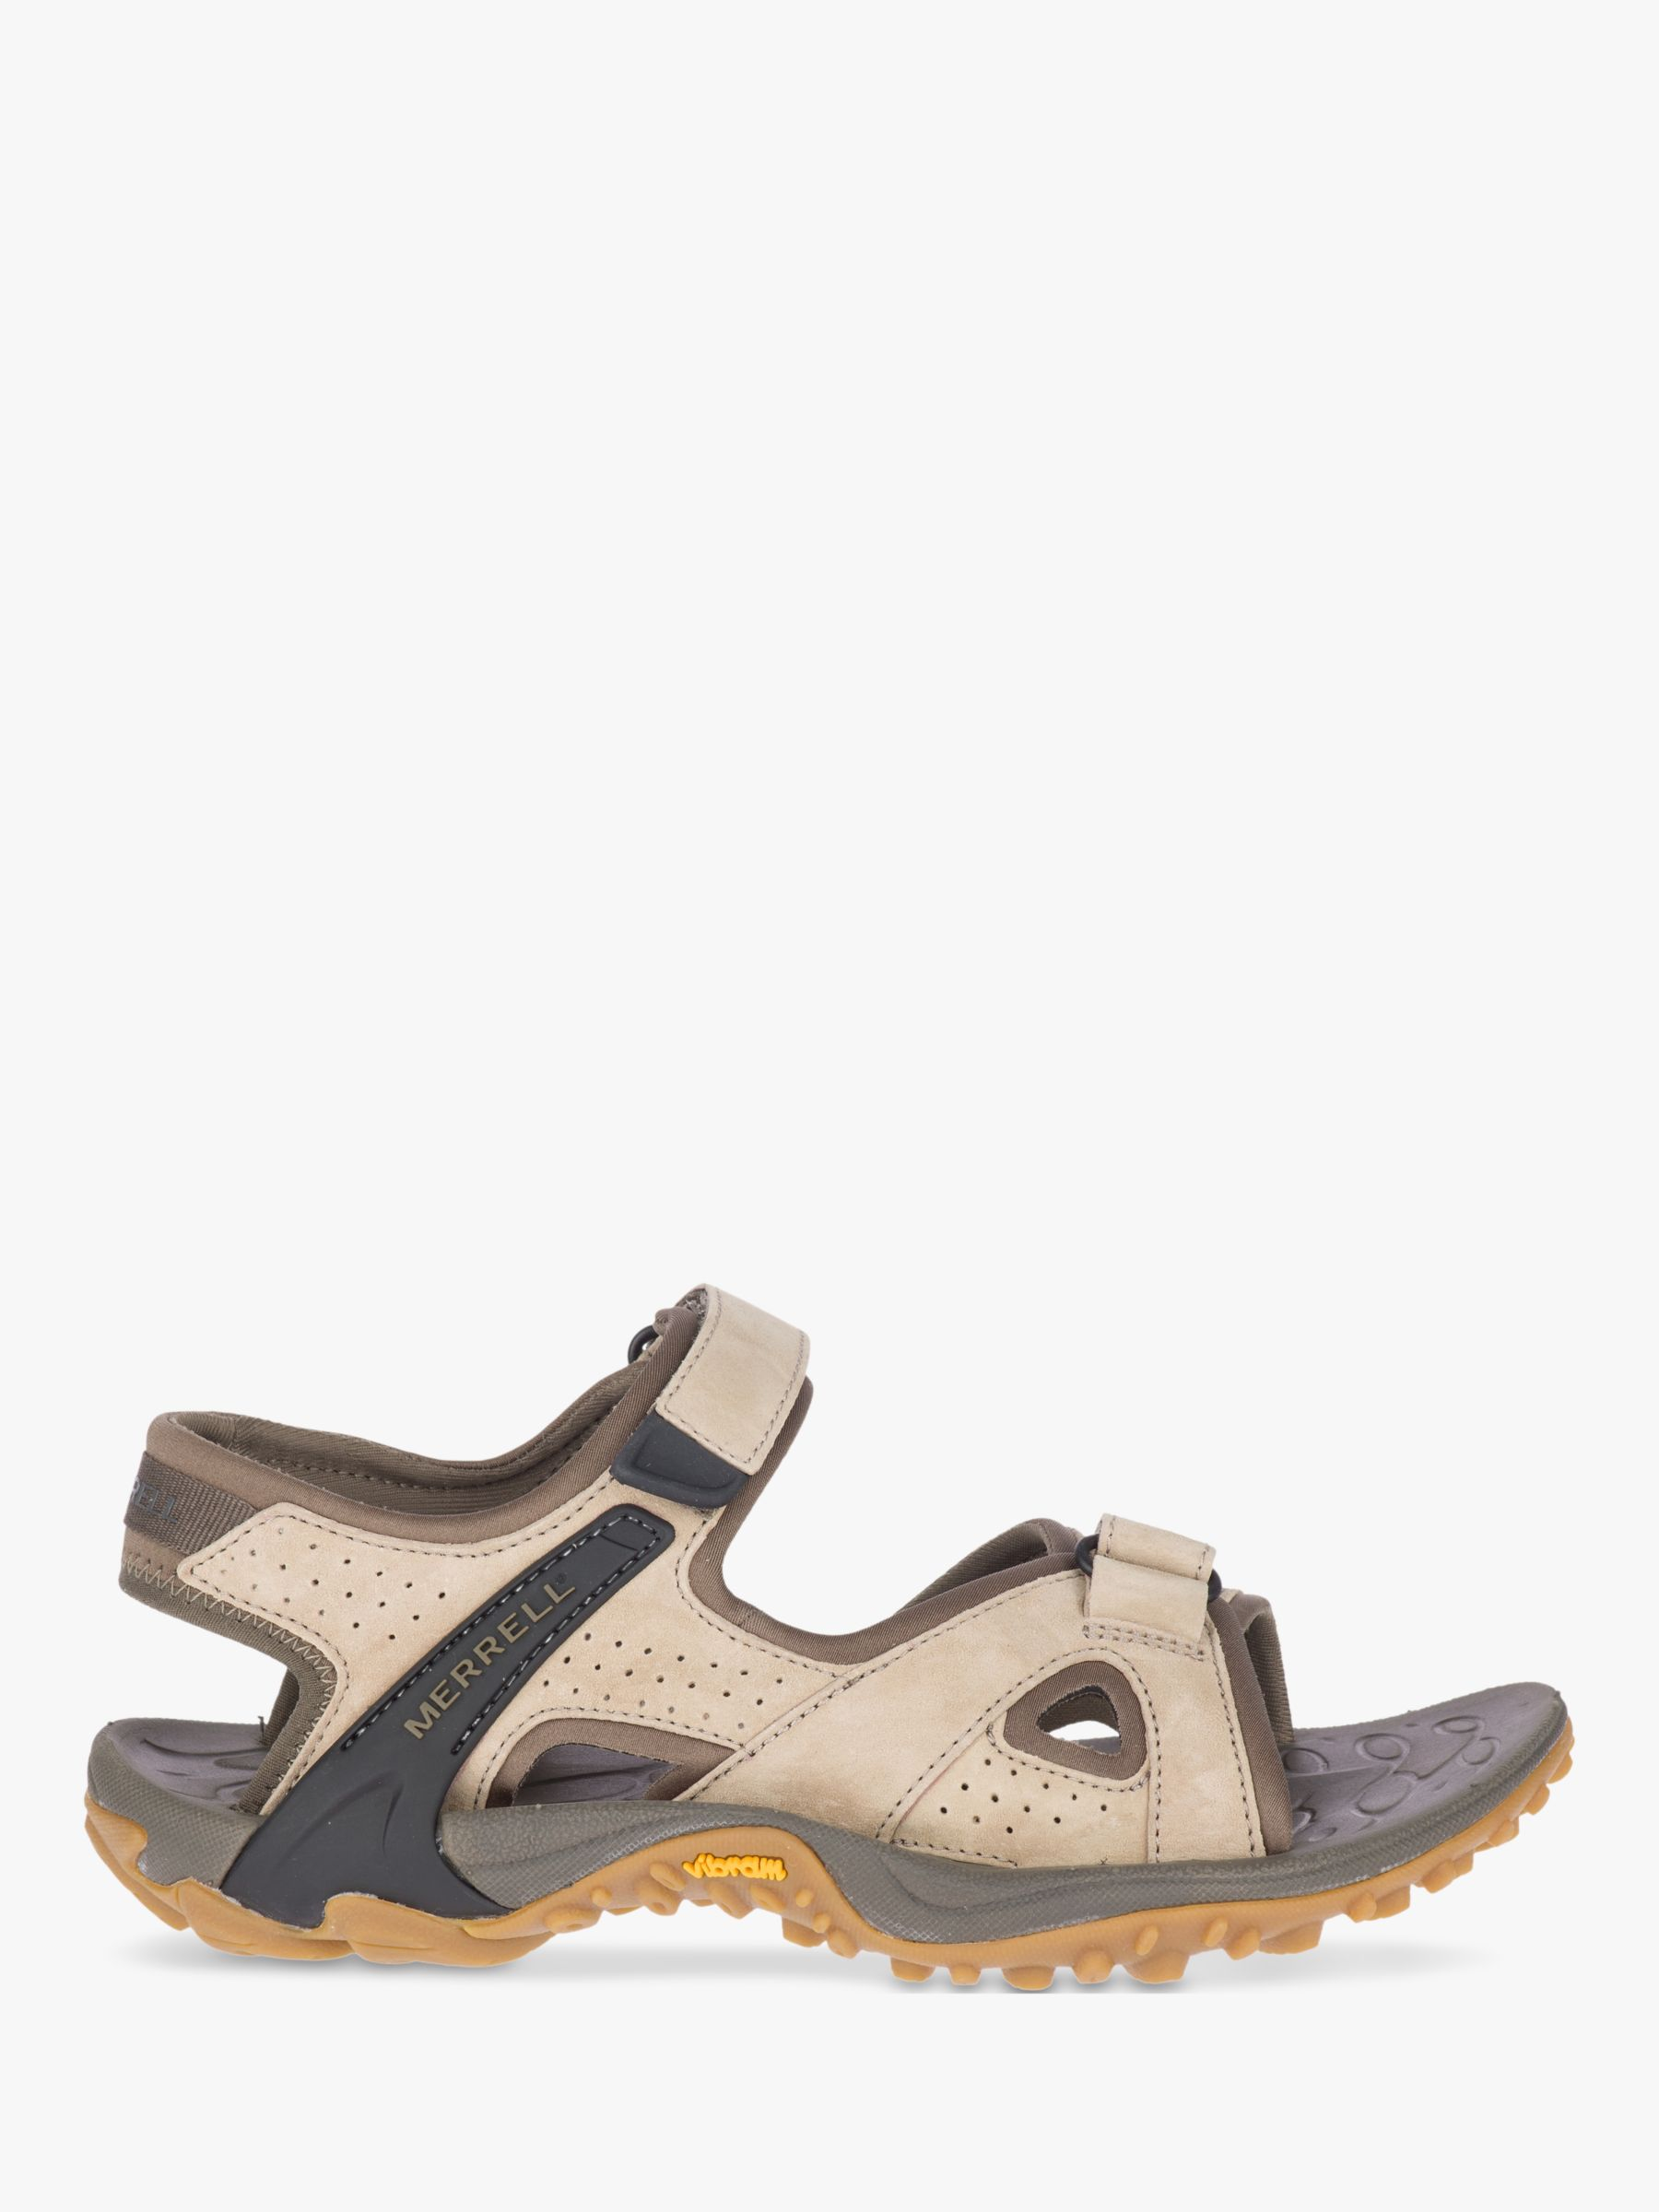 Merrell Merrell Kahuna 4 Men's Walking Sandals, Classic Taupe